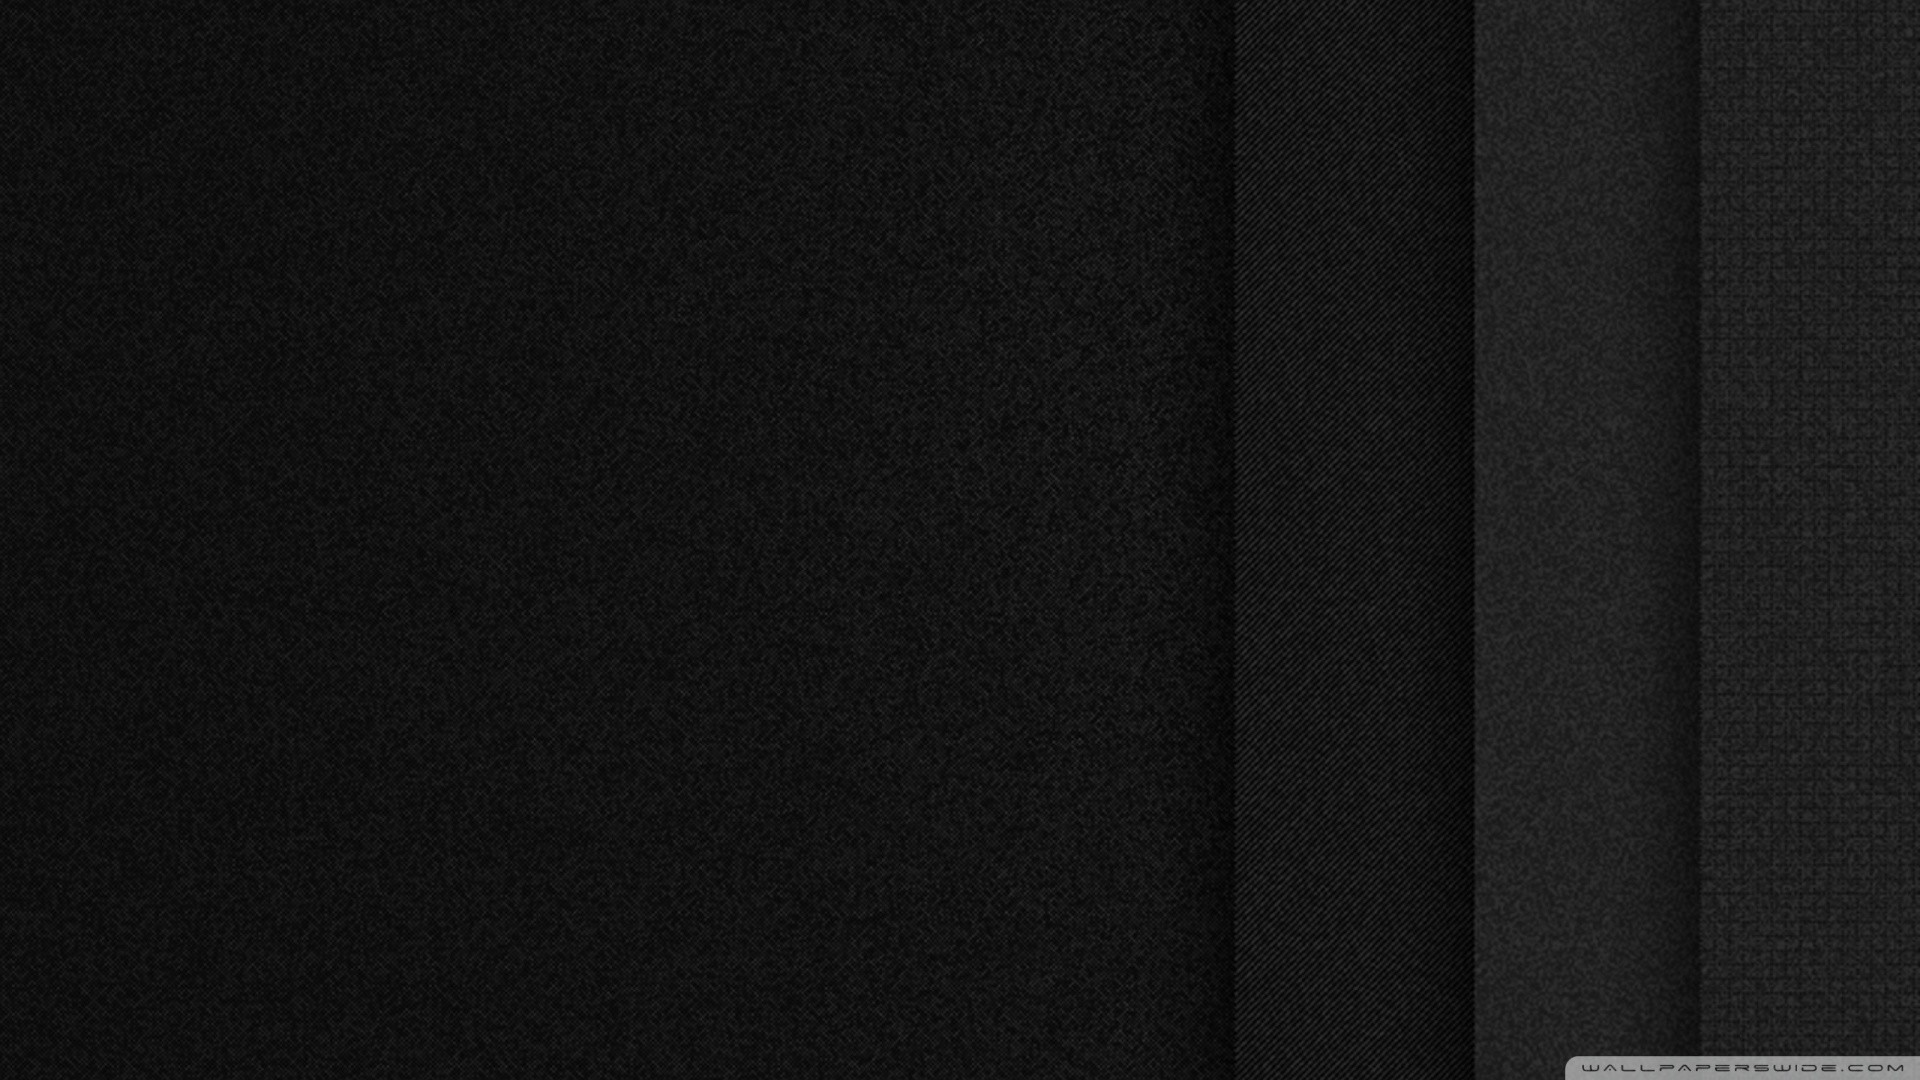 Dark HD Wallpapers 1920x1080 (73+ images)